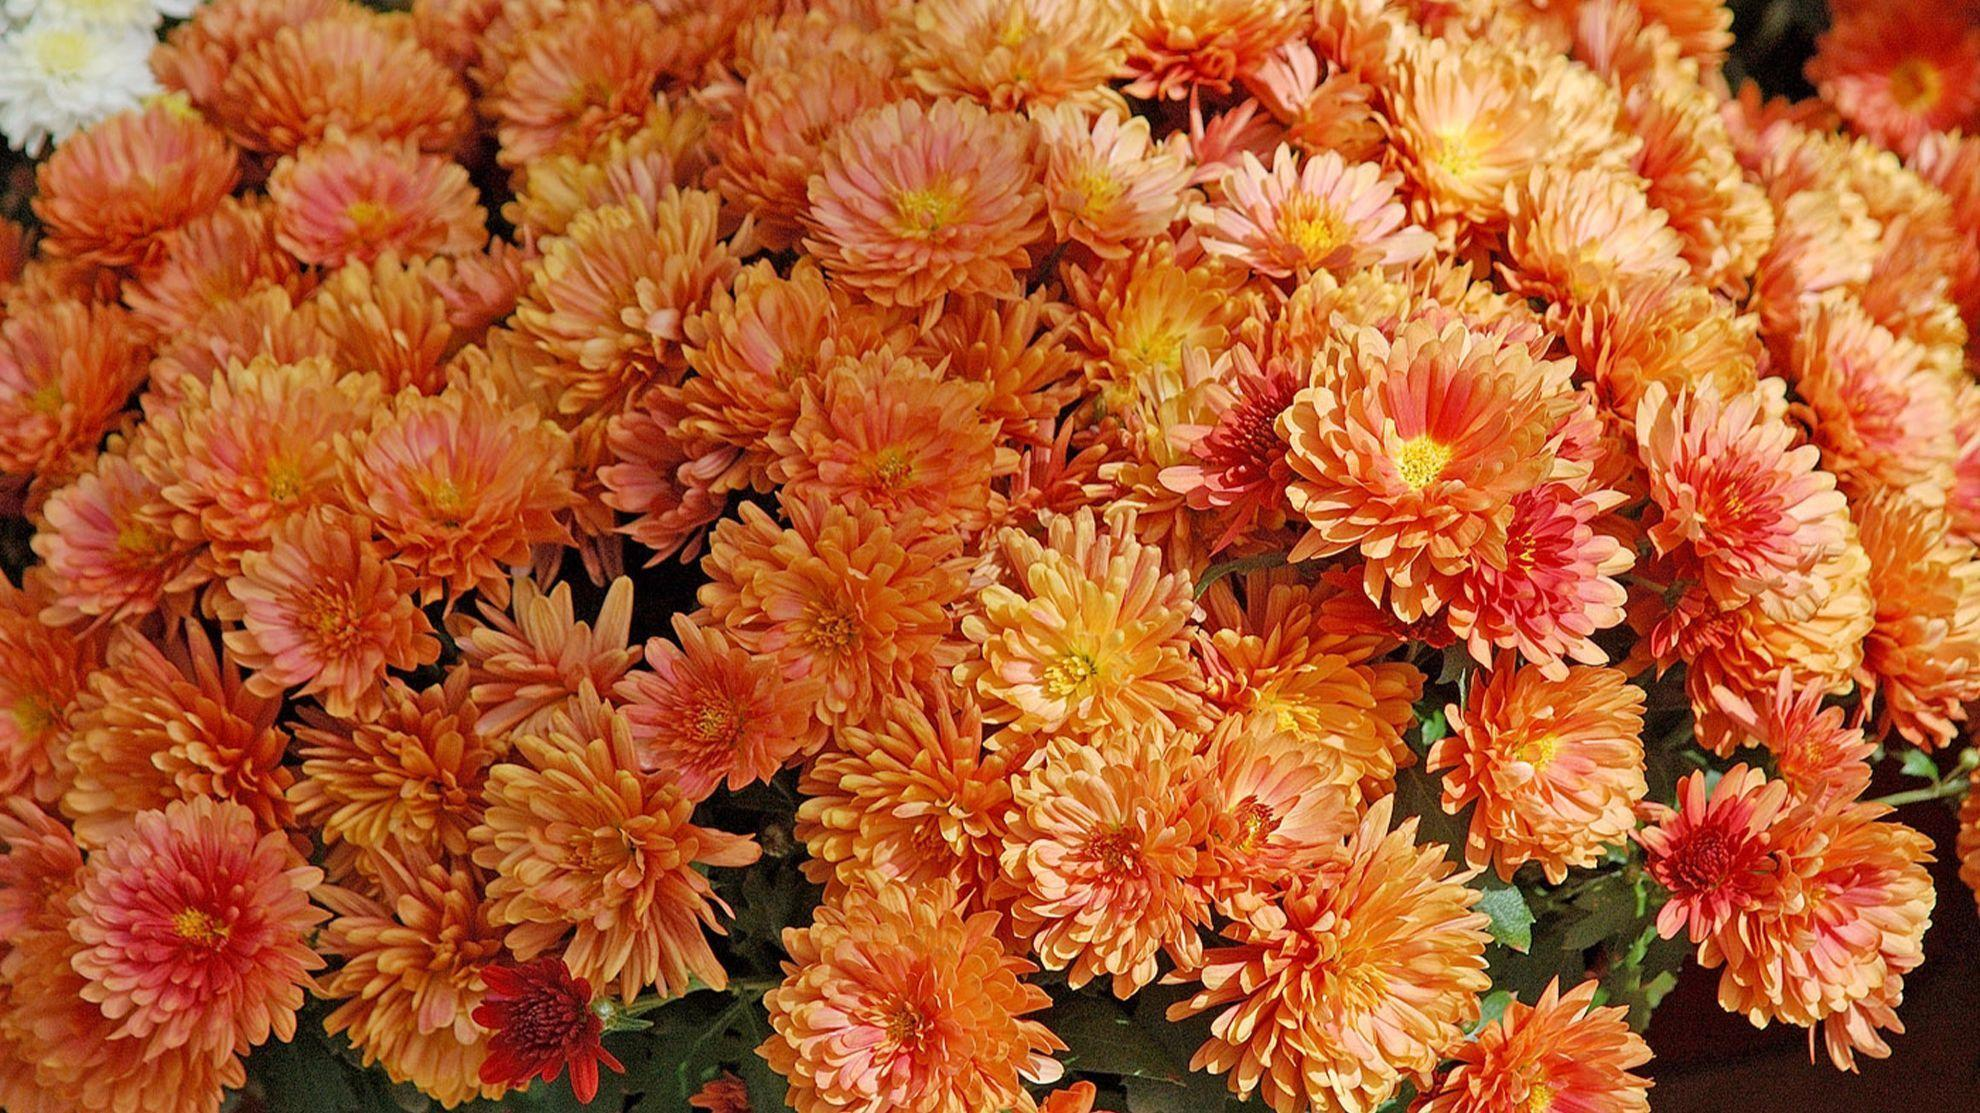 How to keep chrysanthemum